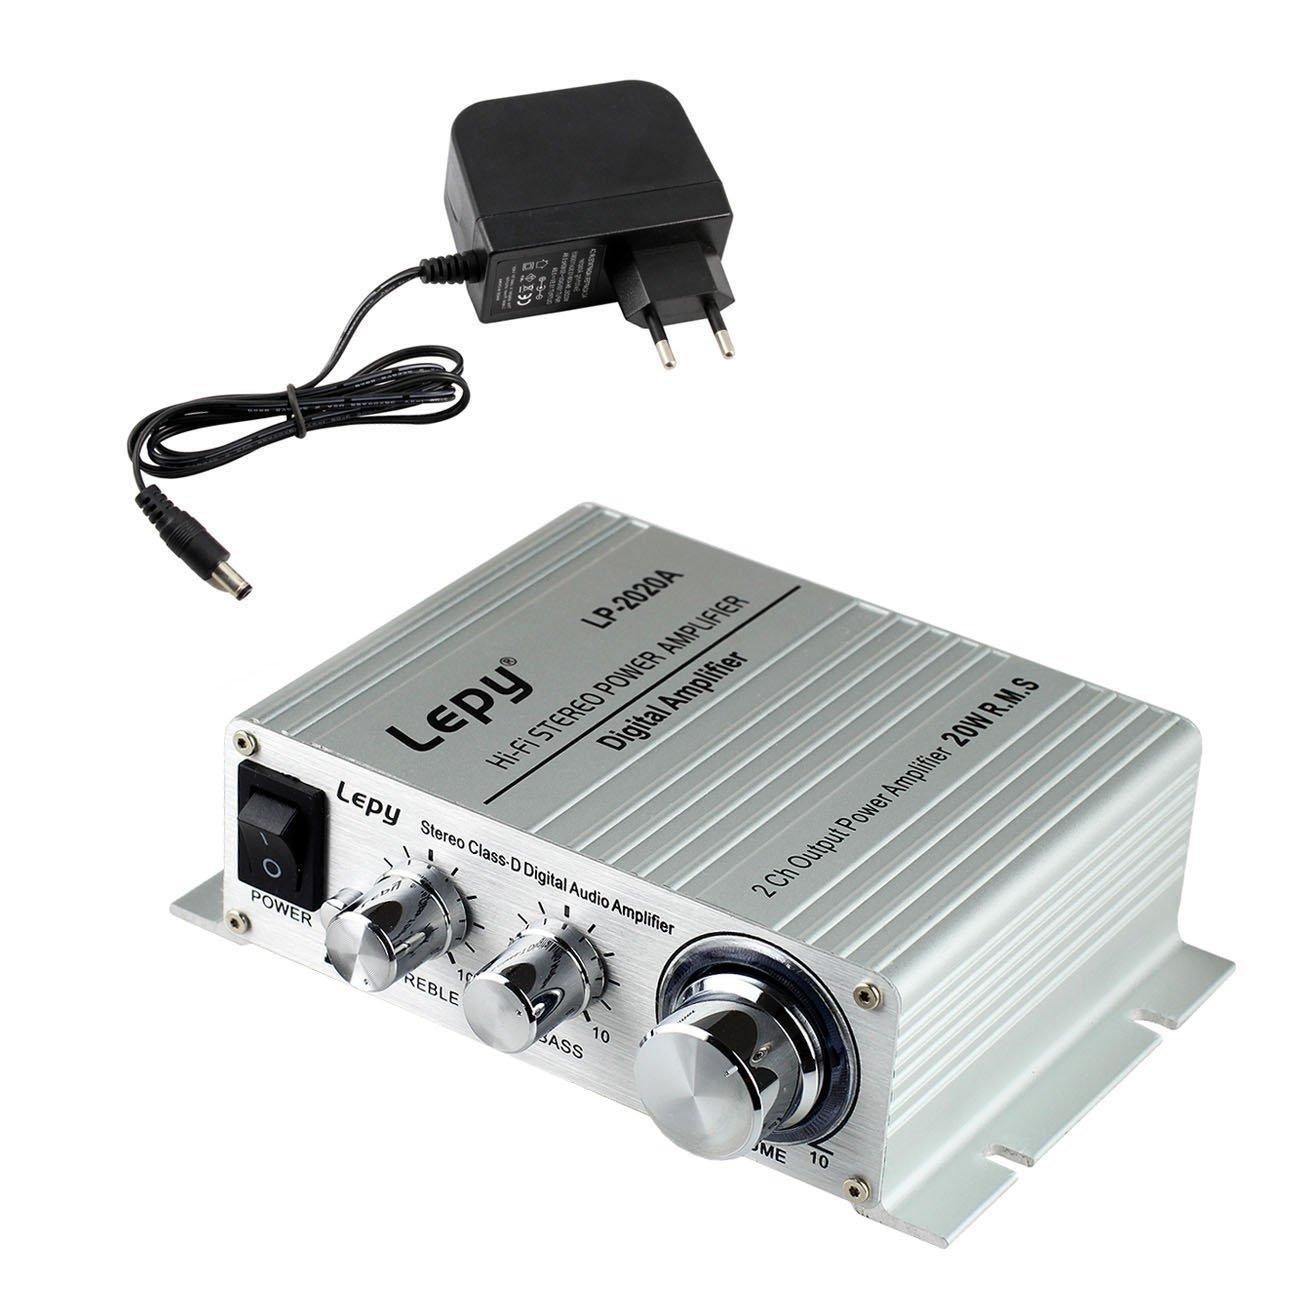 Lepy Lp 2020a Hifi Stereo Design Verstrker Kamera Lp2020a Tripath Classt Audio Mini Amplifier With Power Supply